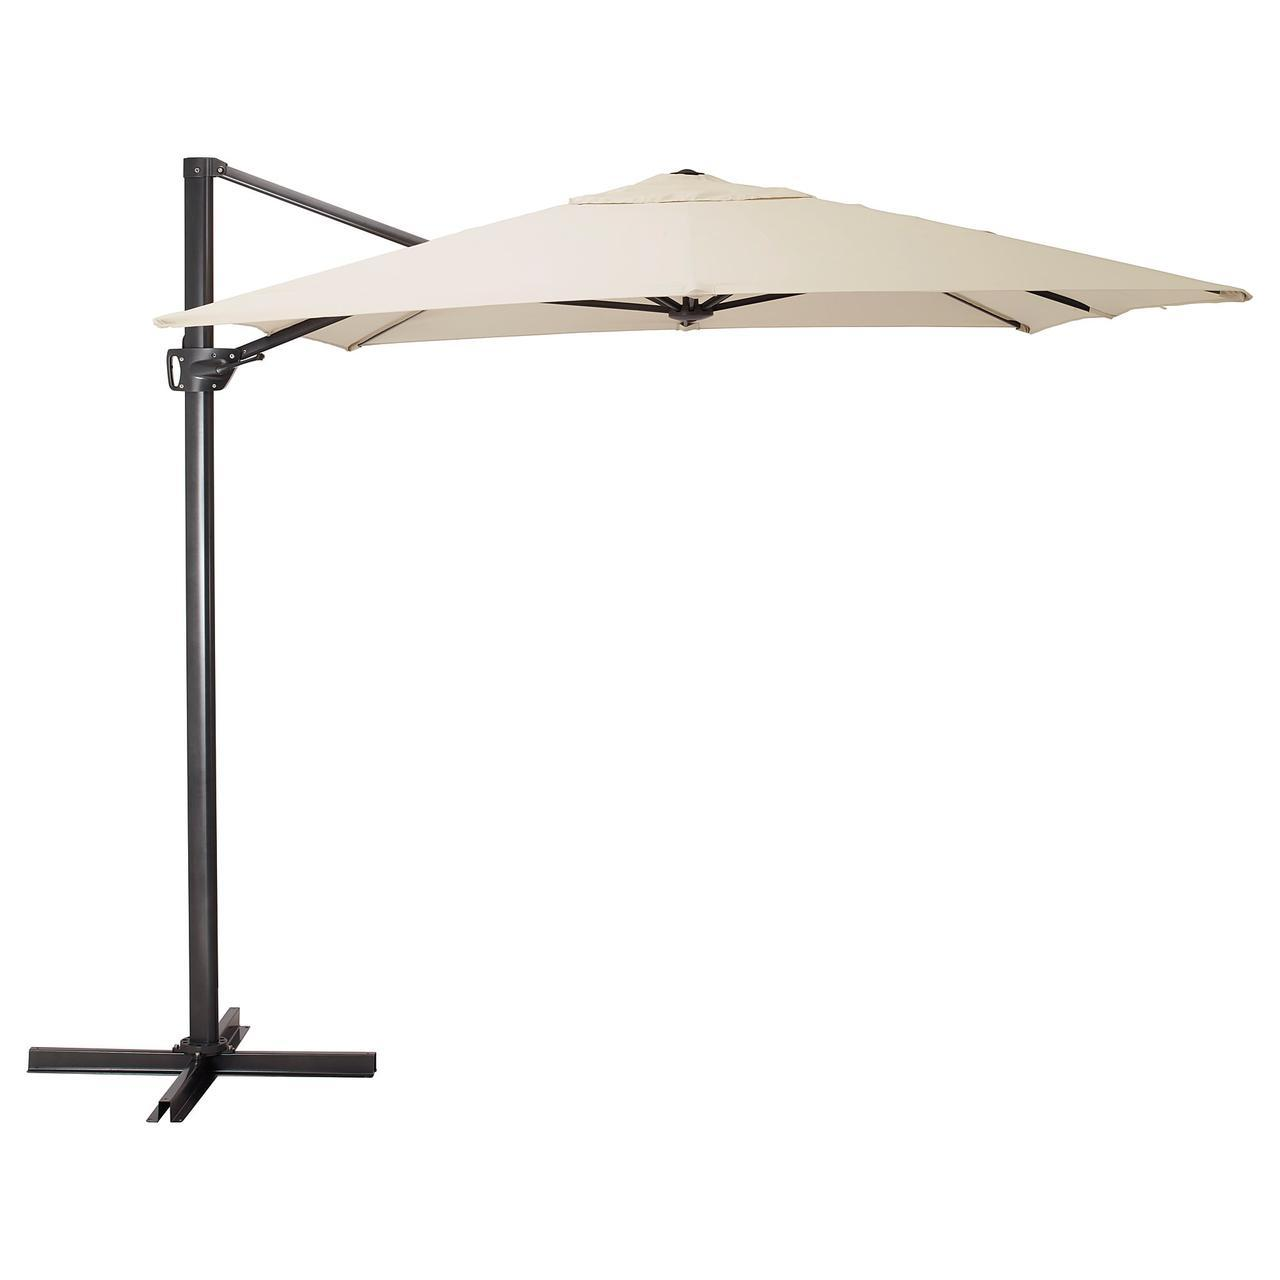 IKEA SEGLARO (303.878.68) Подвесной зонт, с наклоном